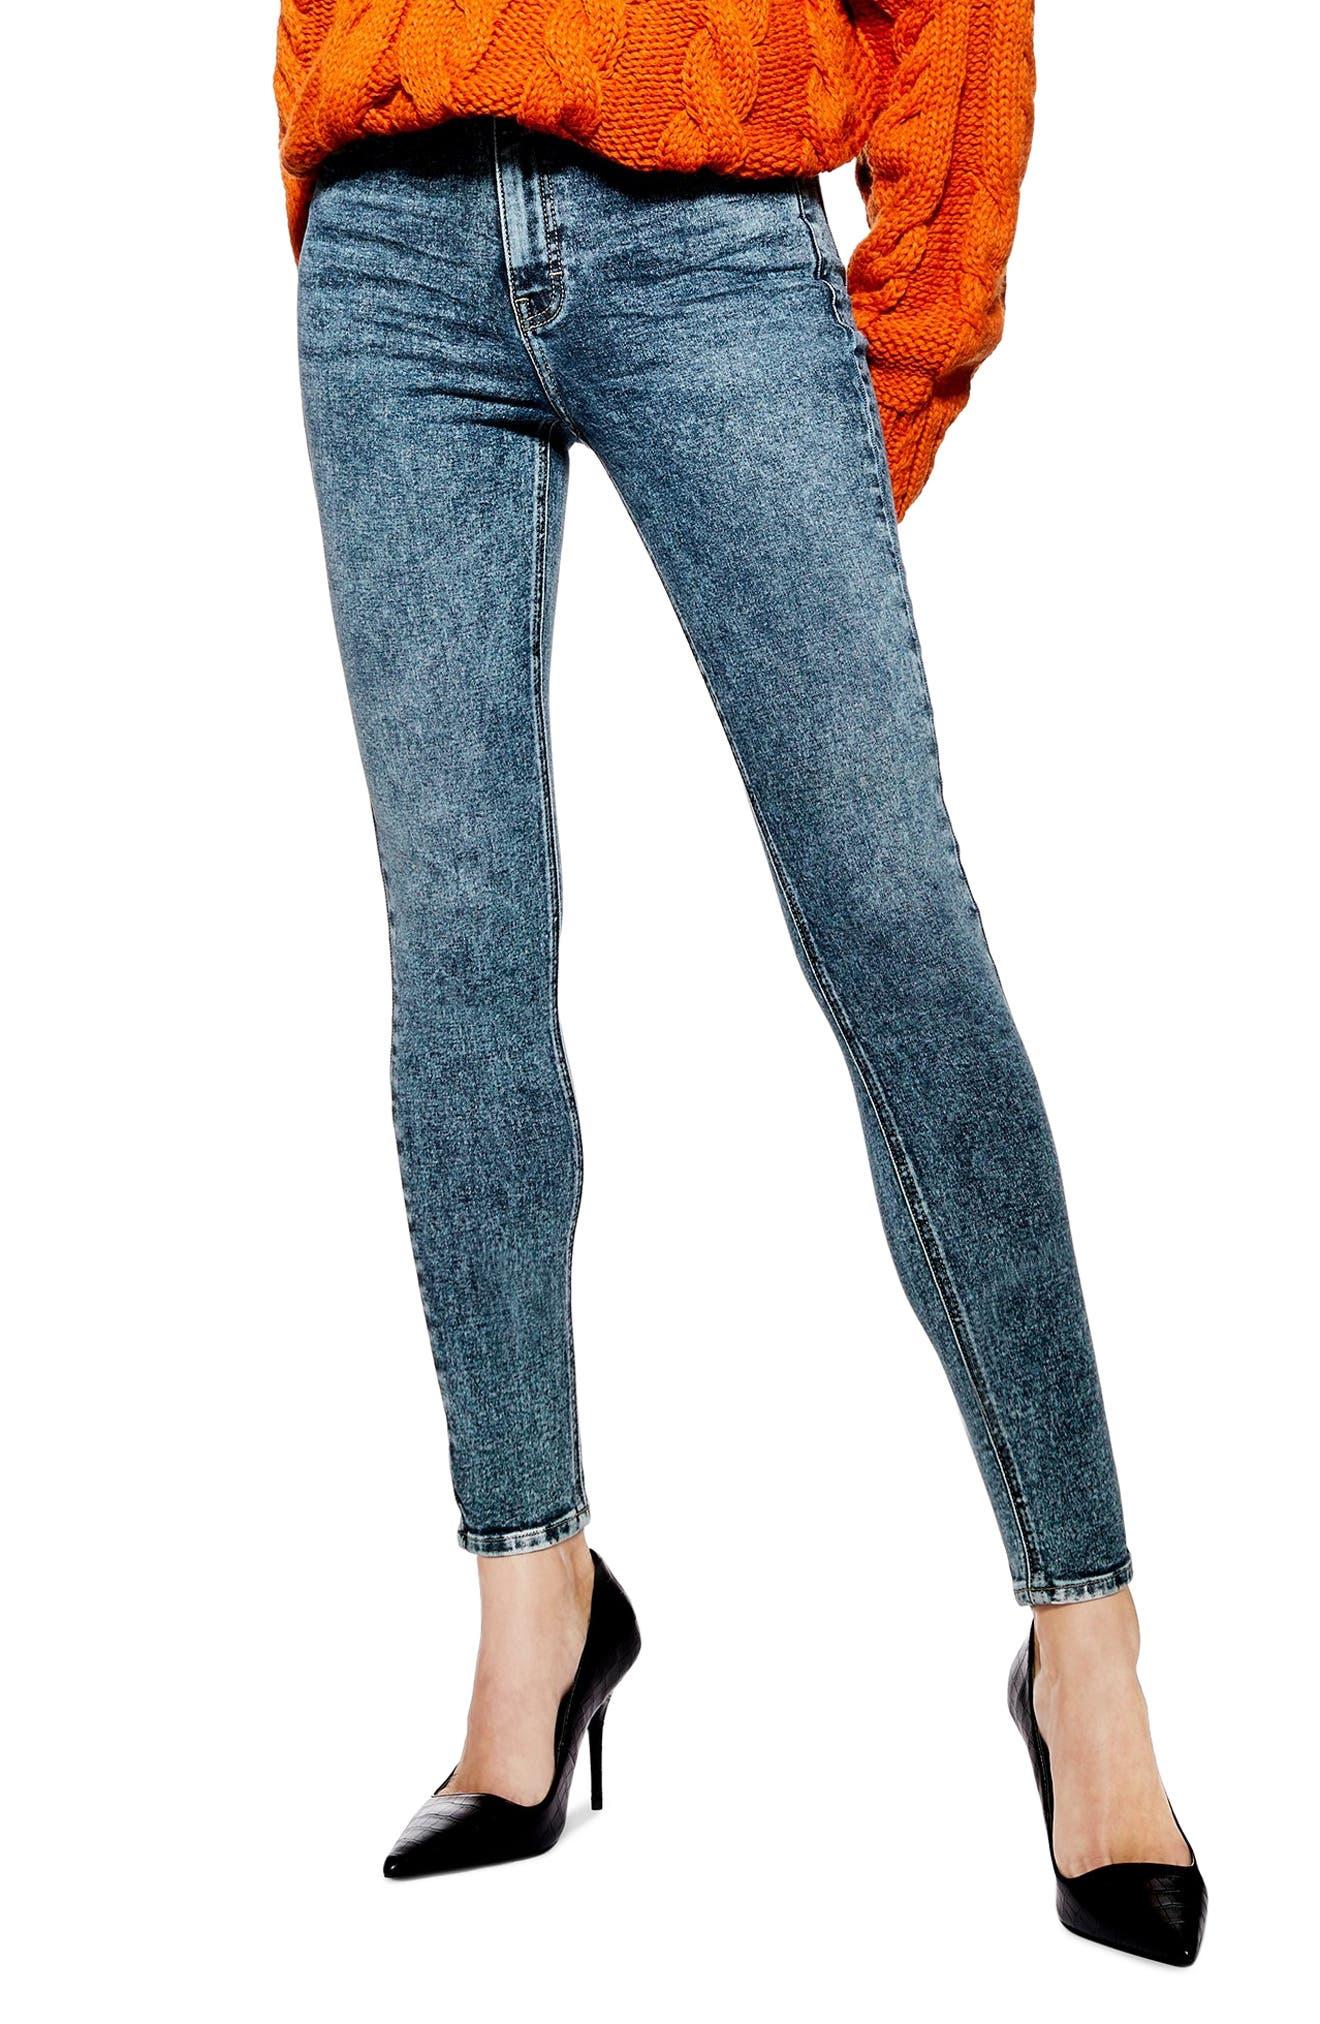 Topshop Jamie Acid Wash High Waist Skinny Jeans